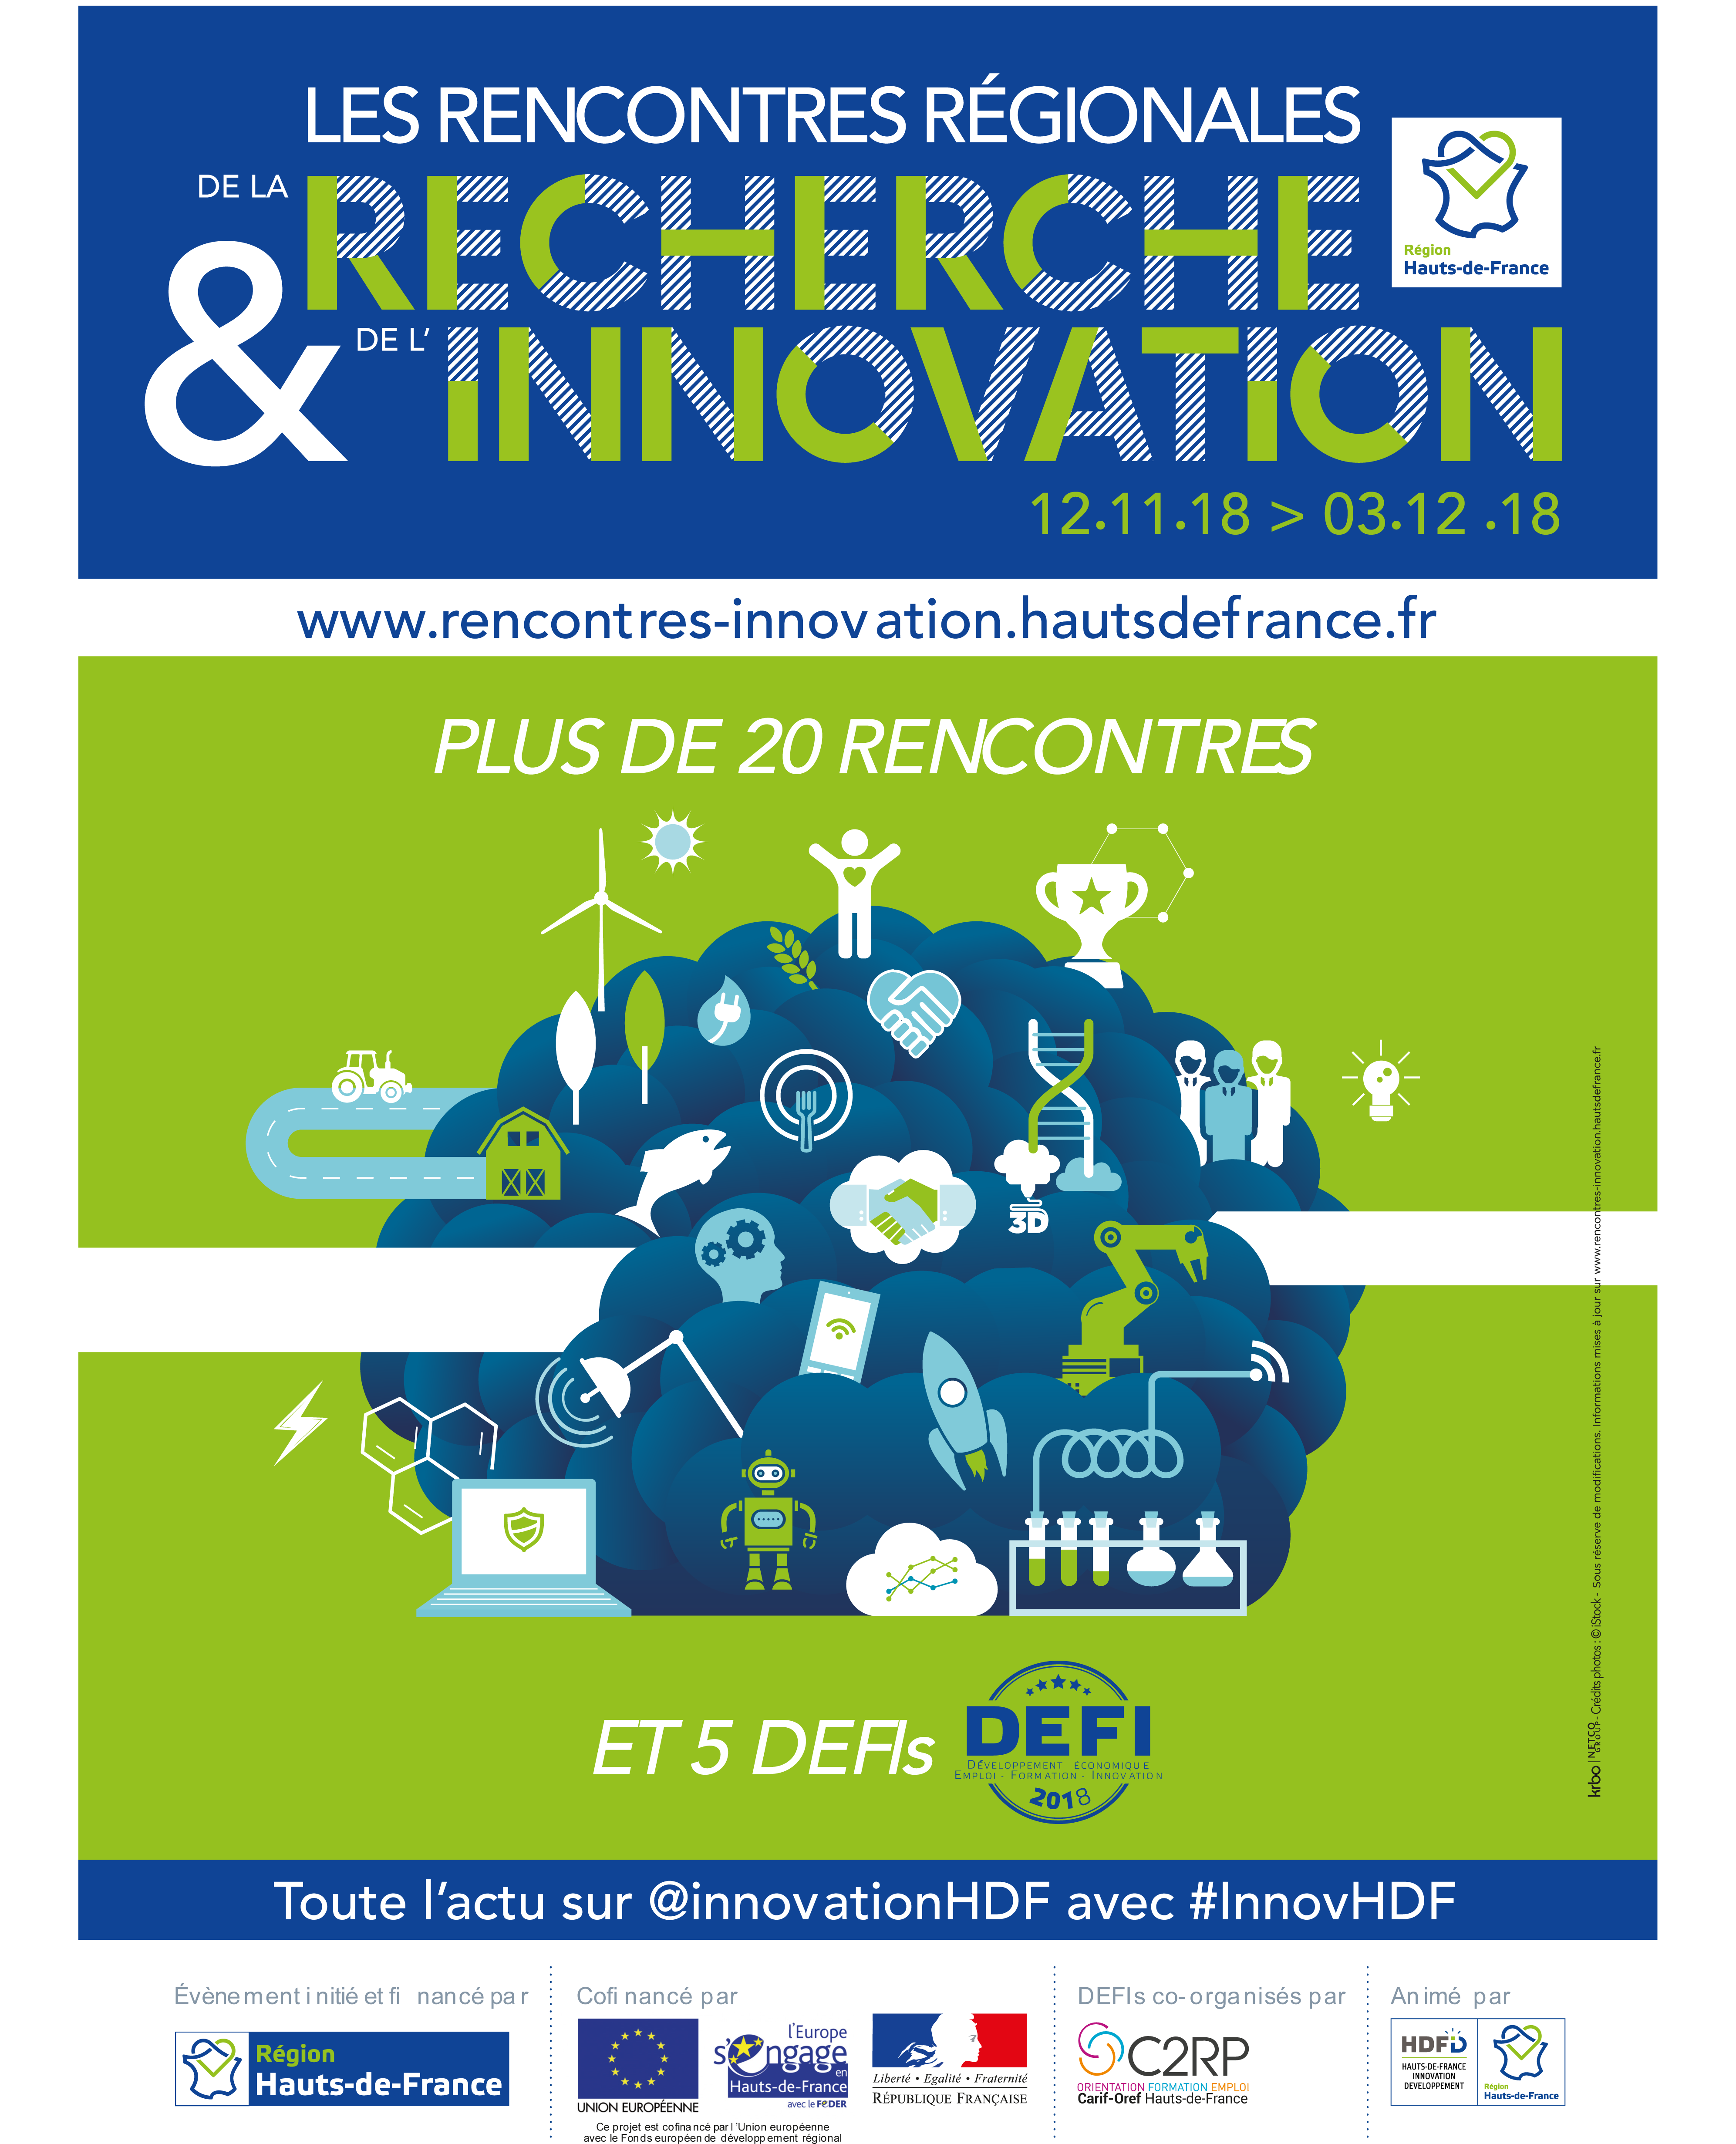 Rencontres regionales de l'innovation 2018